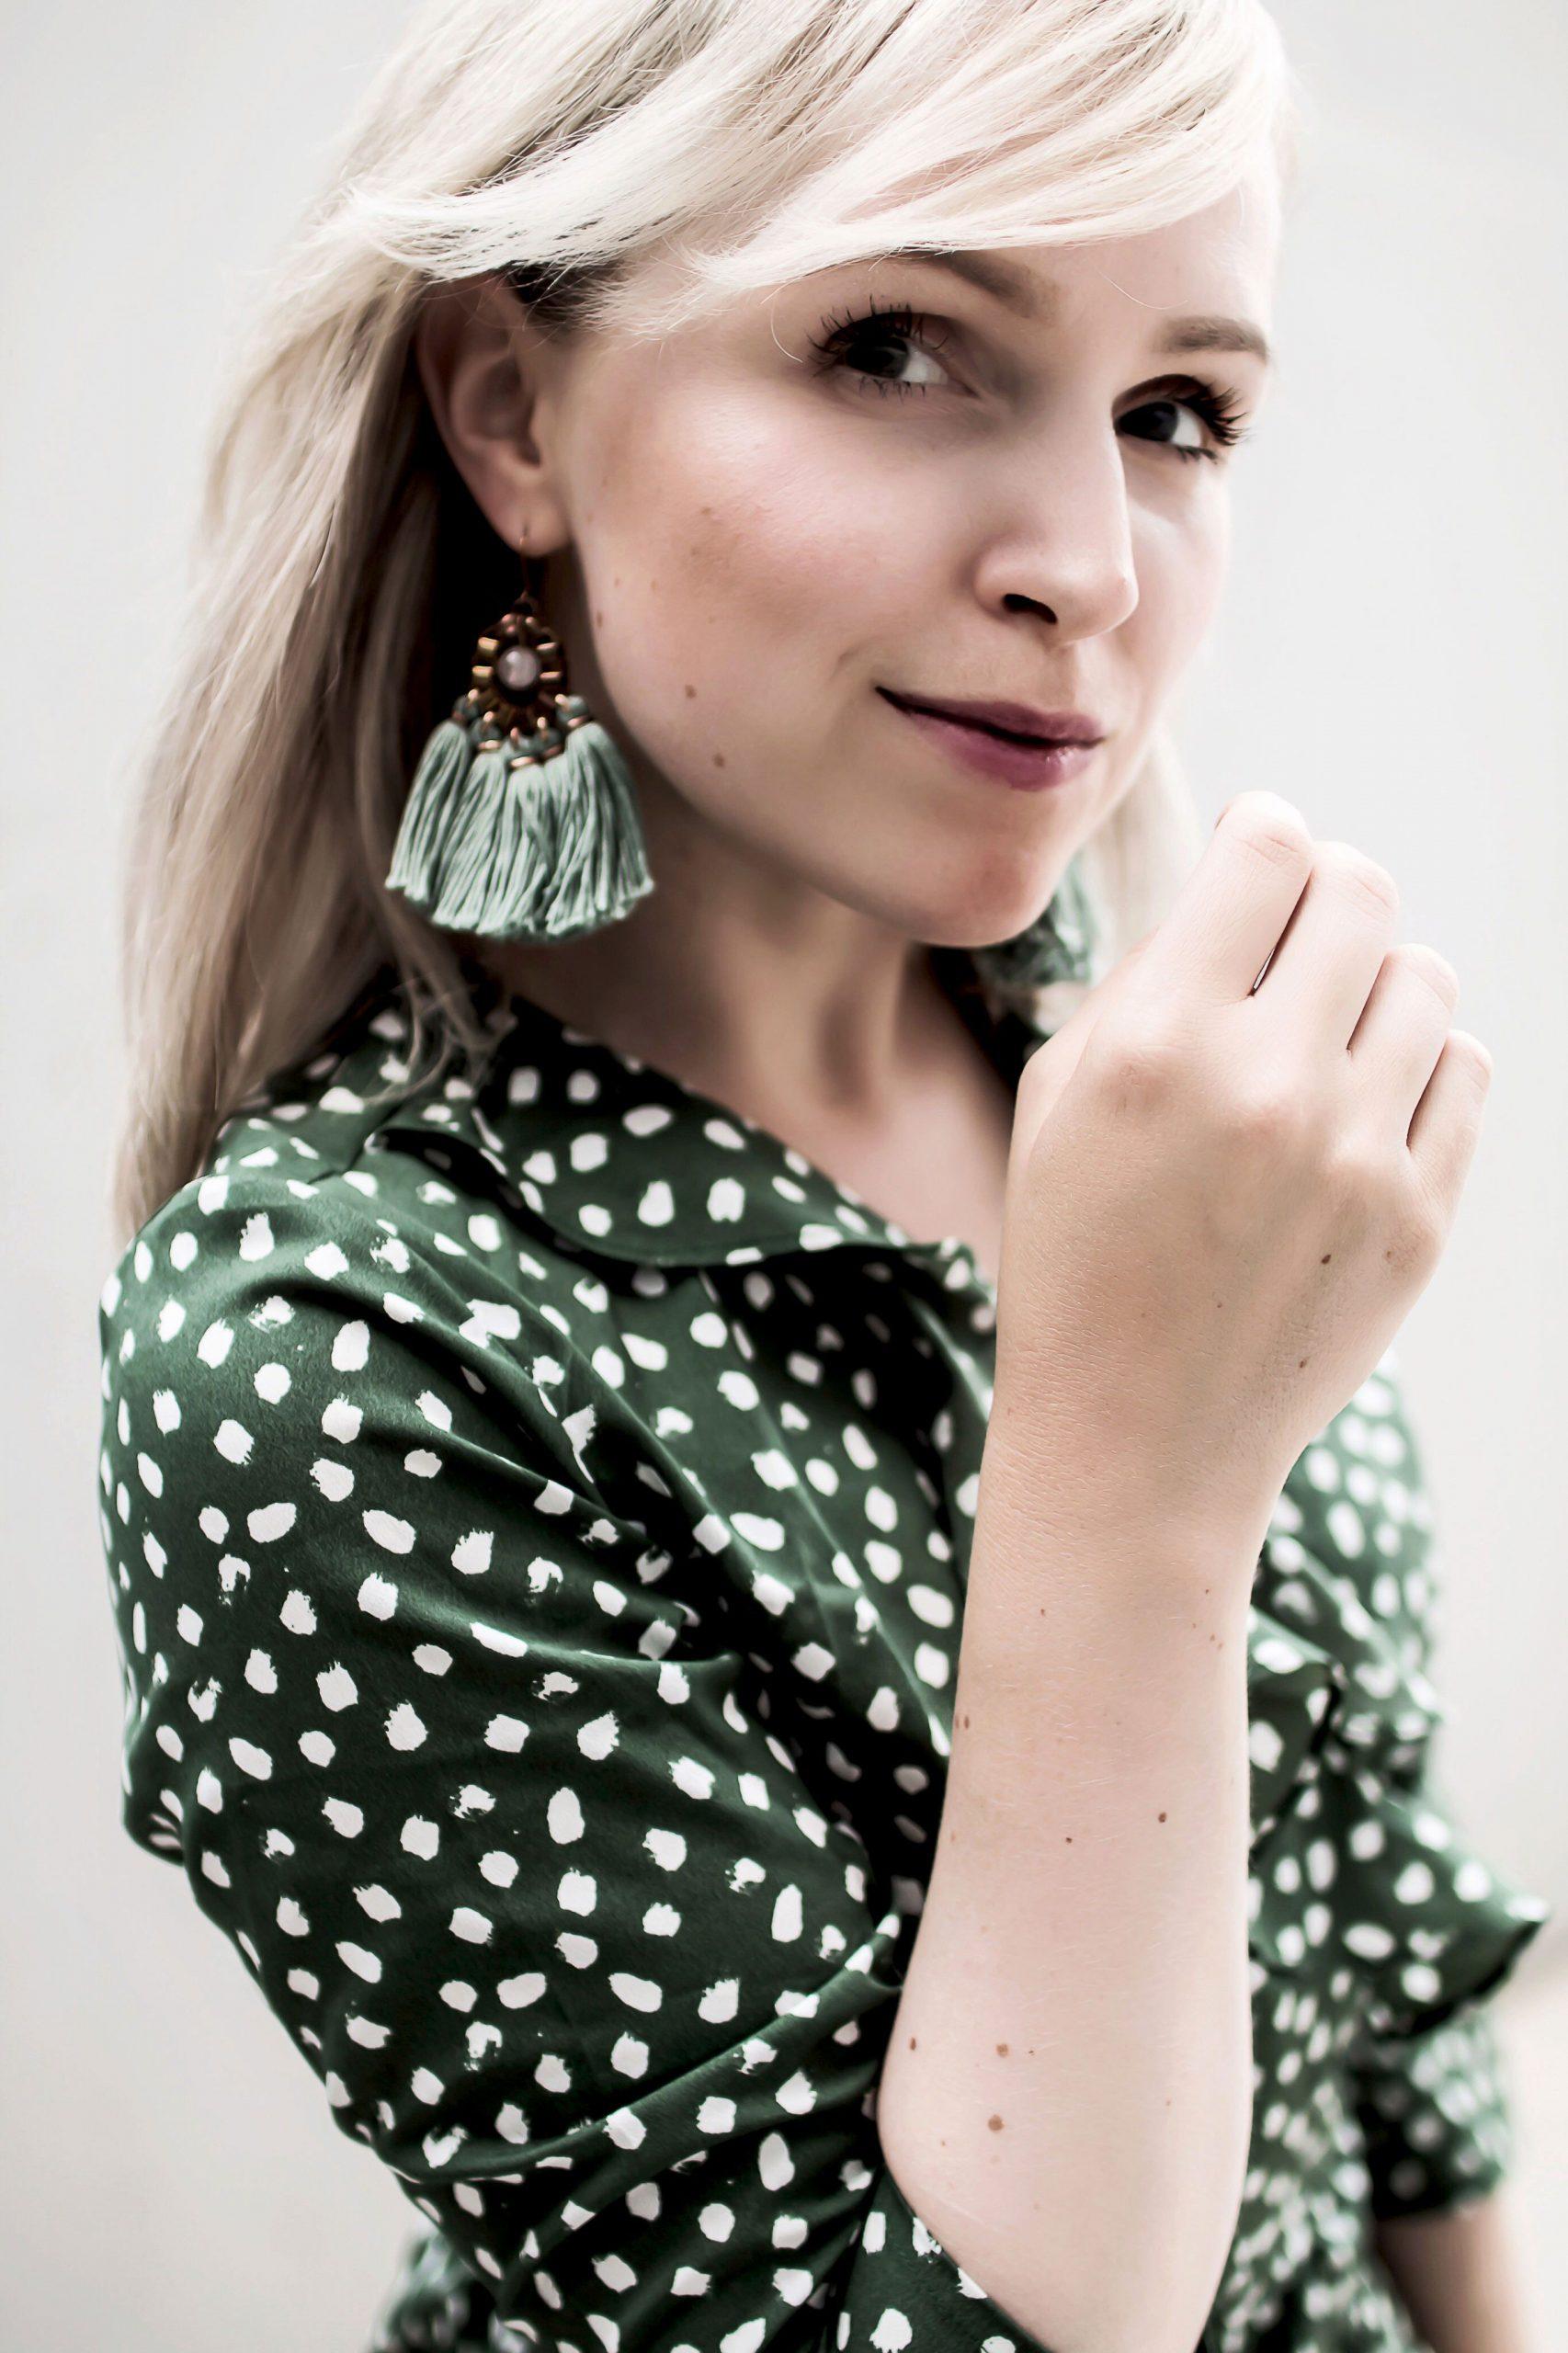 10 Wunderbar Abendkleid Vero Moda Stylish Genial Abendkleid Vero Moda Spezialgebiet